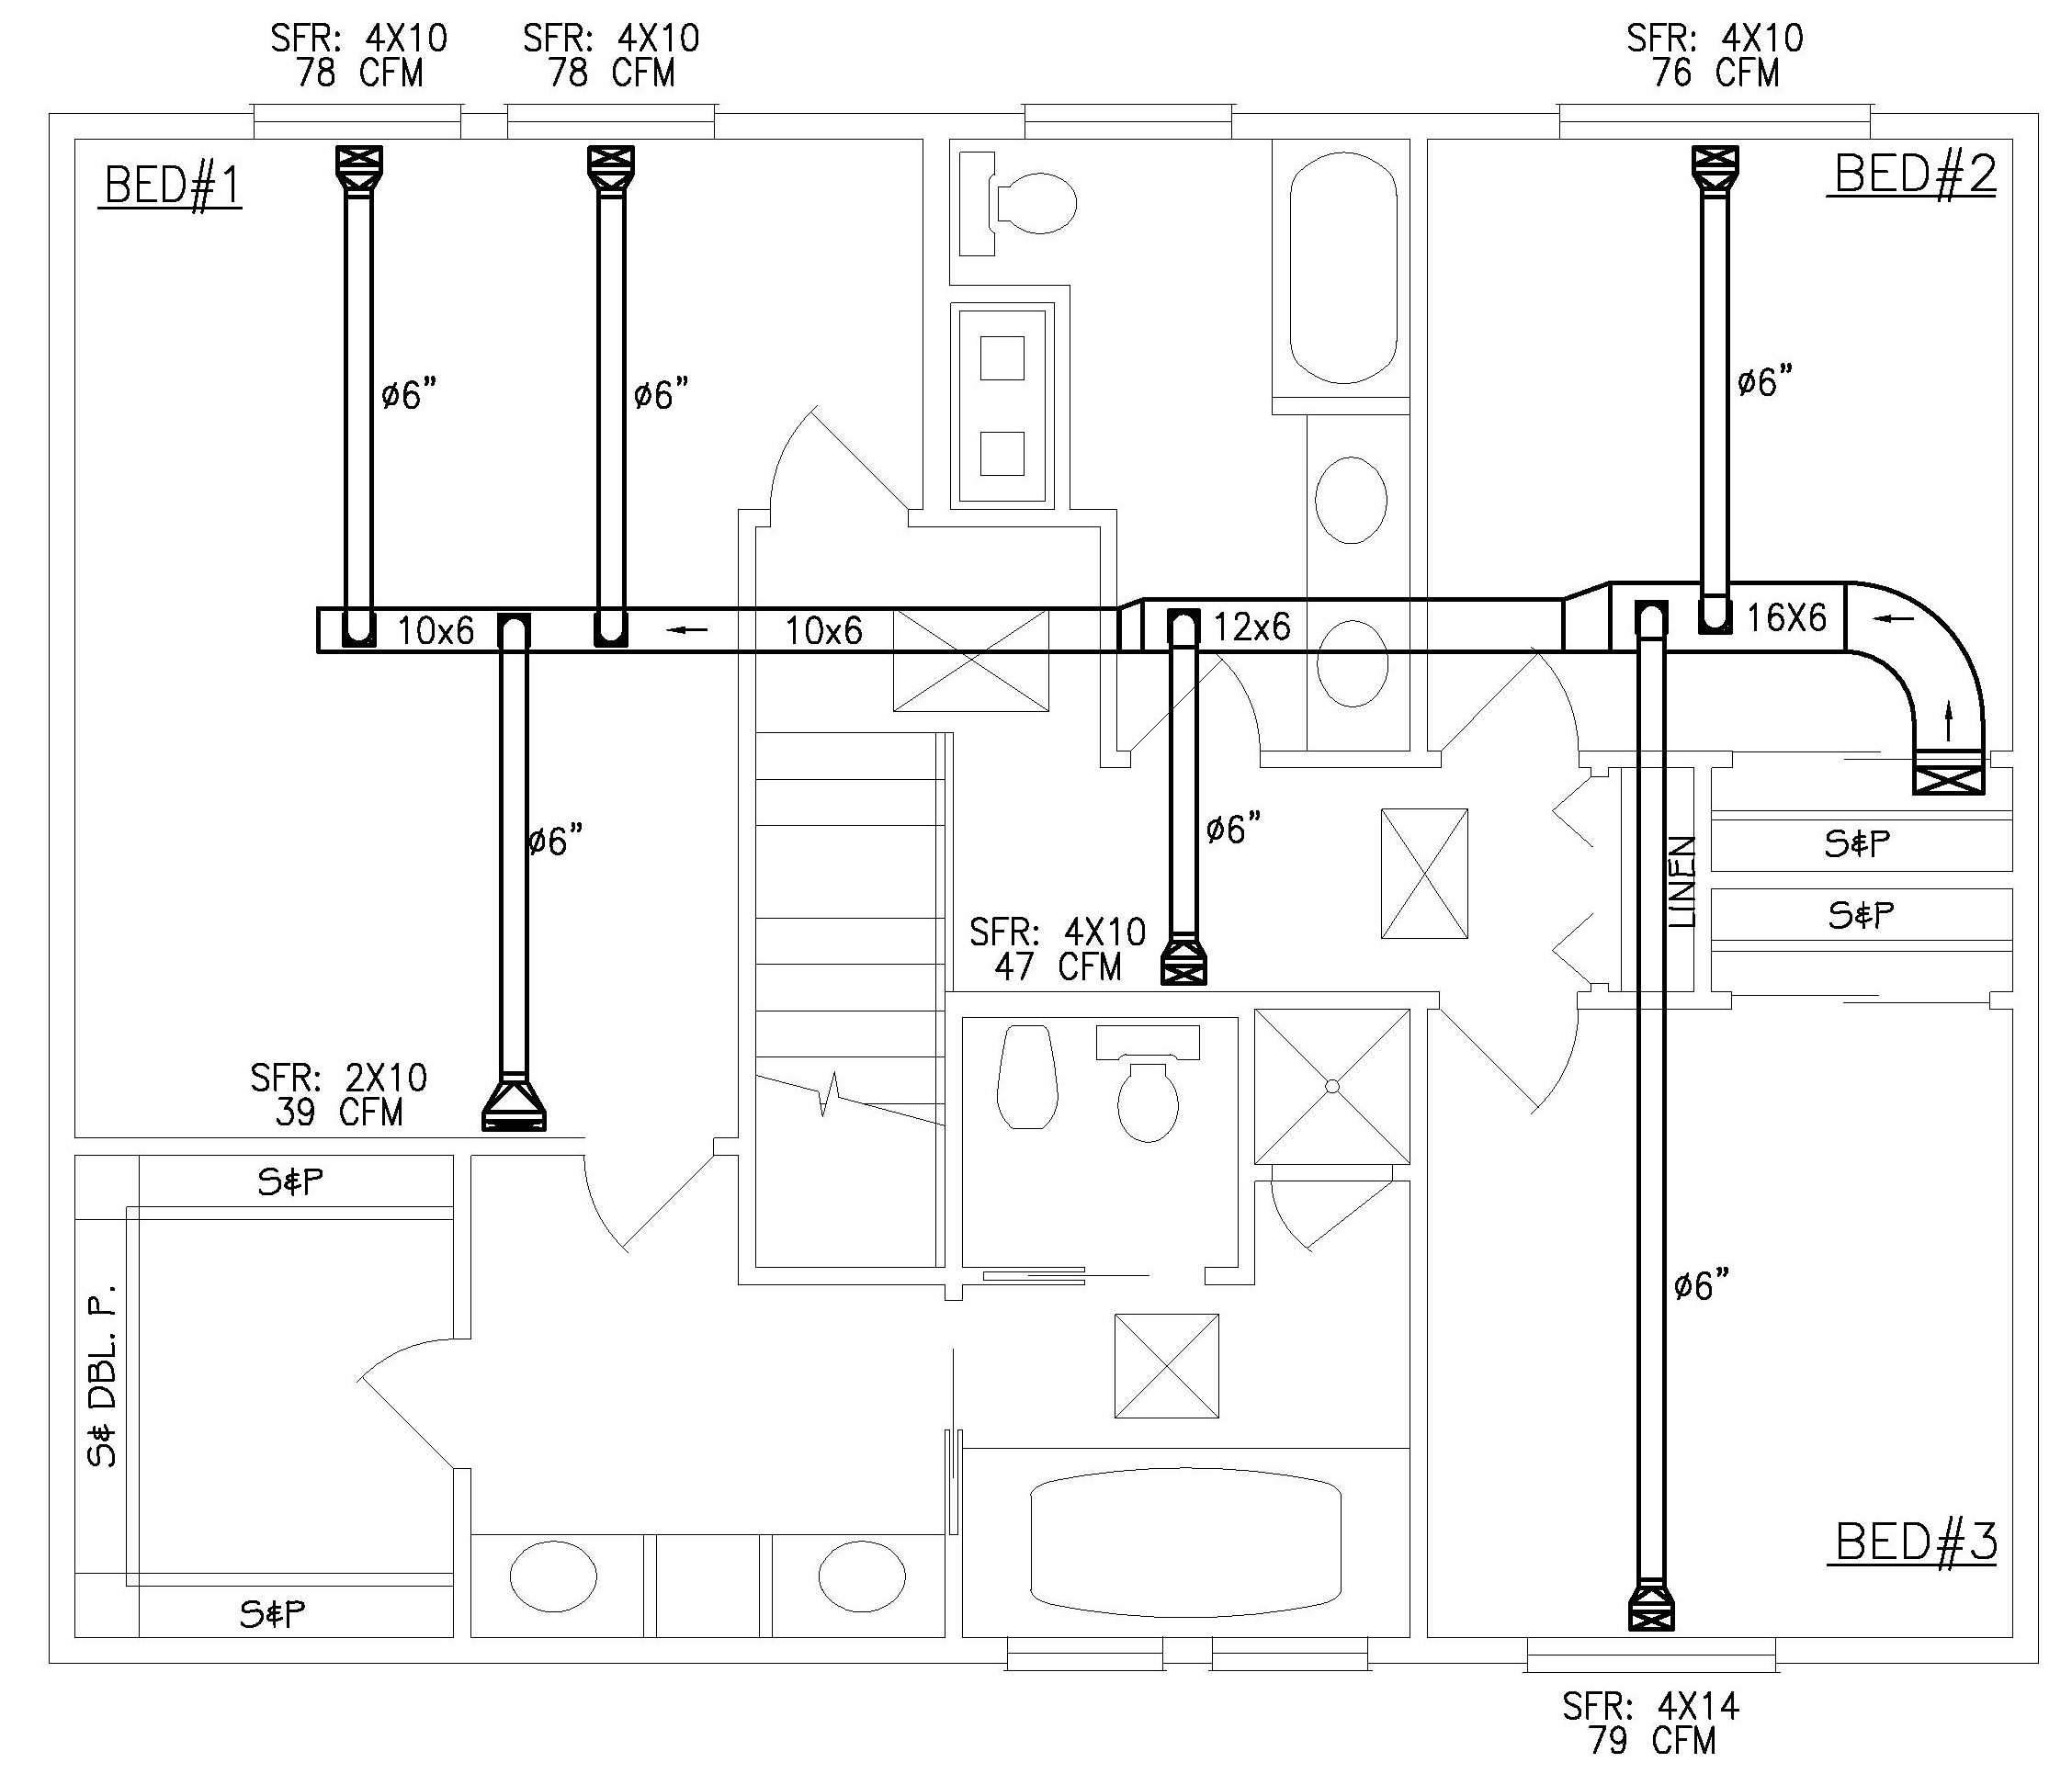 HVAC Plans by Raymond Alberga at Coroflot.com